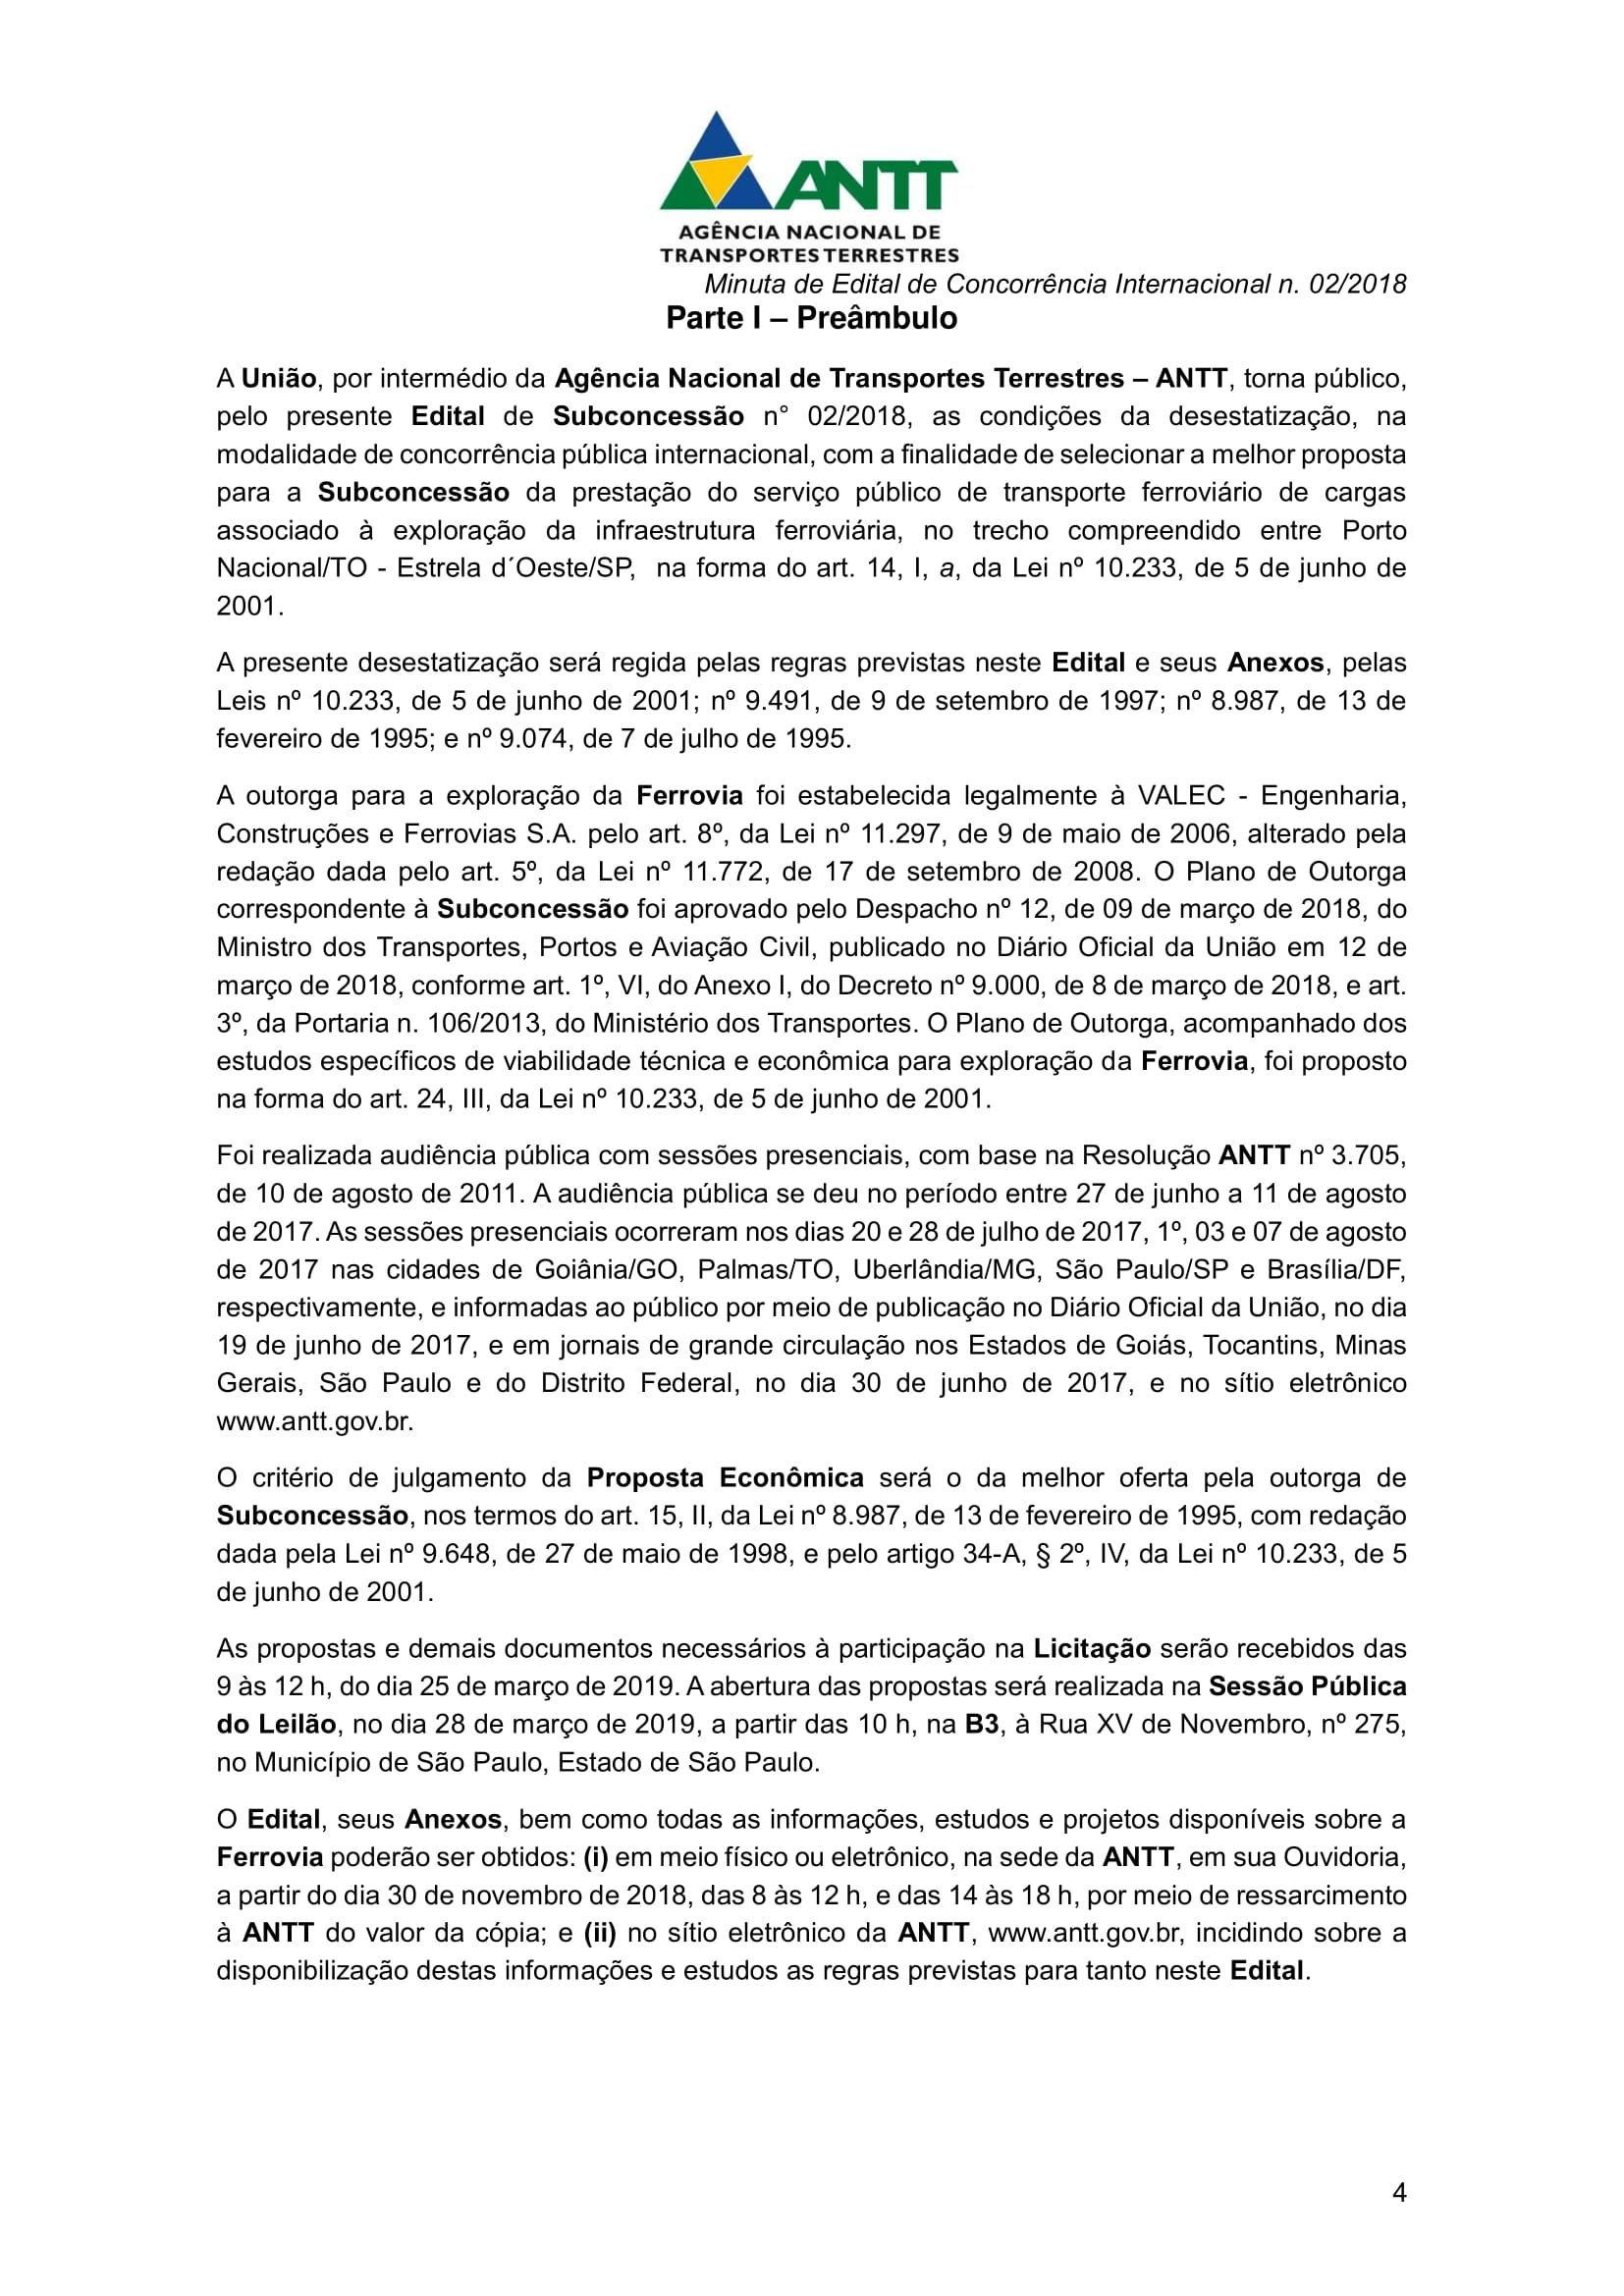 minuta_de_edital_-_porto_nacional-estrela_doeste-04